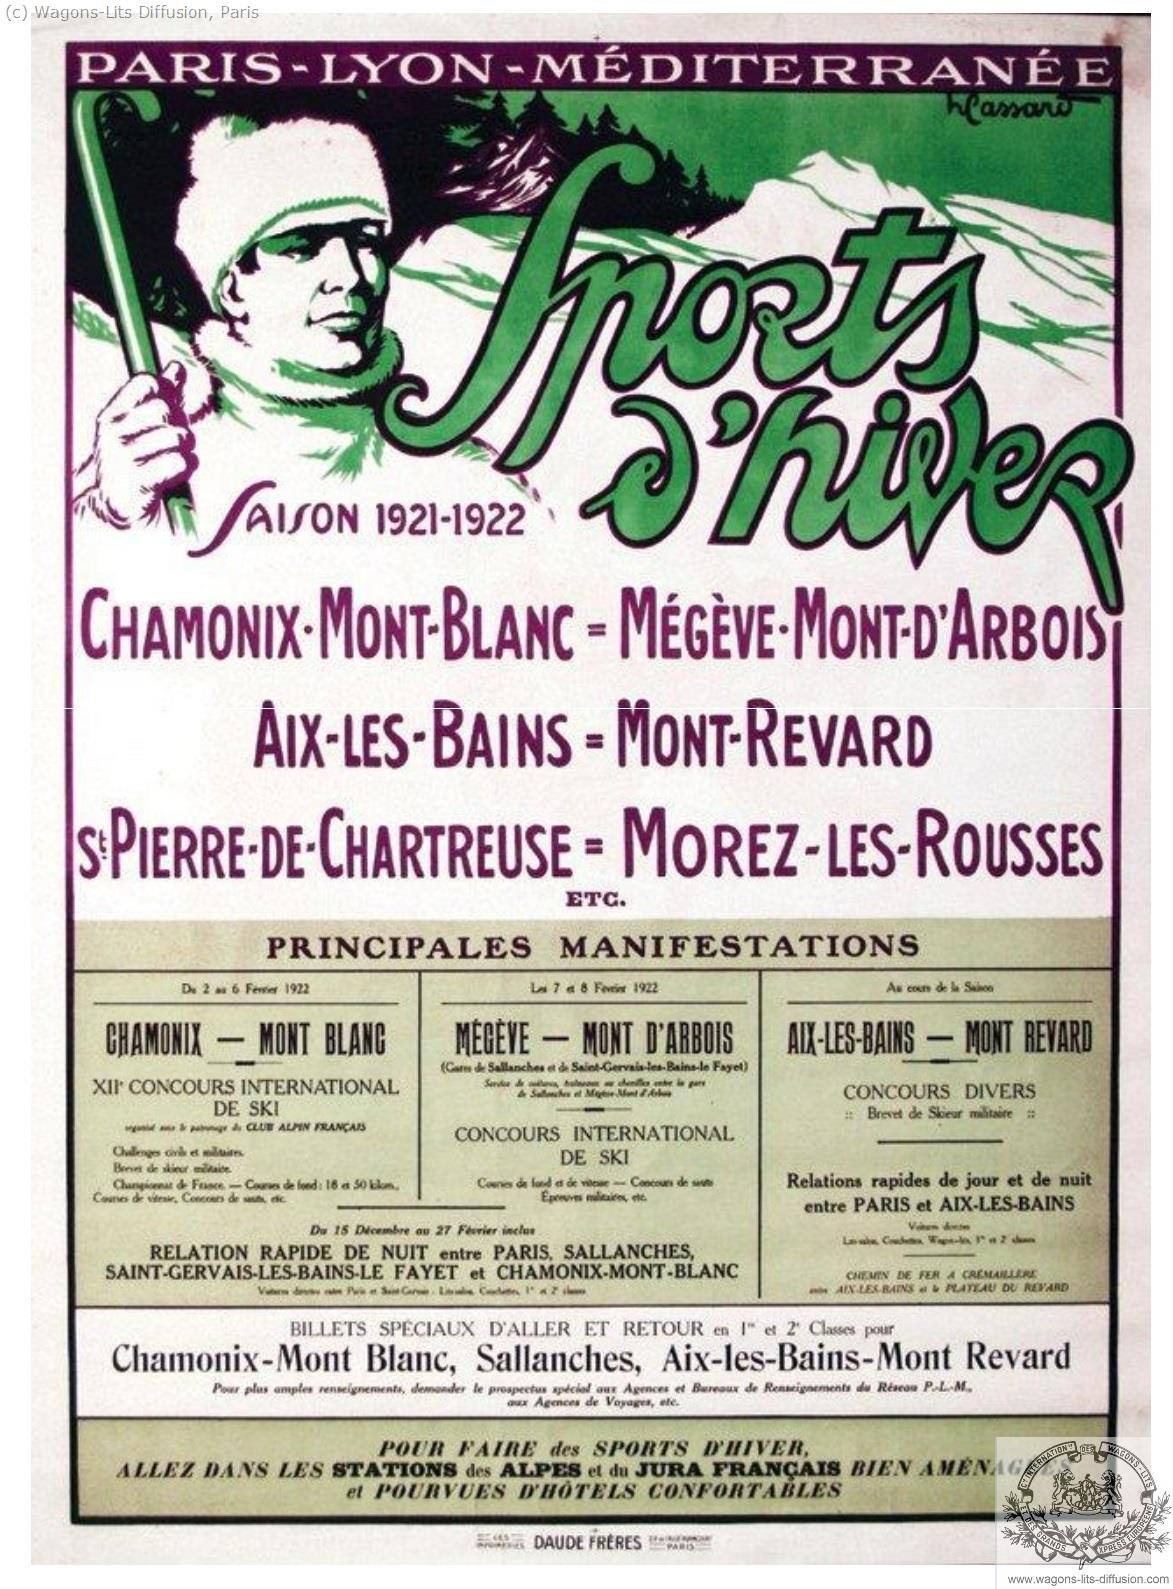 PLM Chamonix Aix Mont Revard Horaires 1921